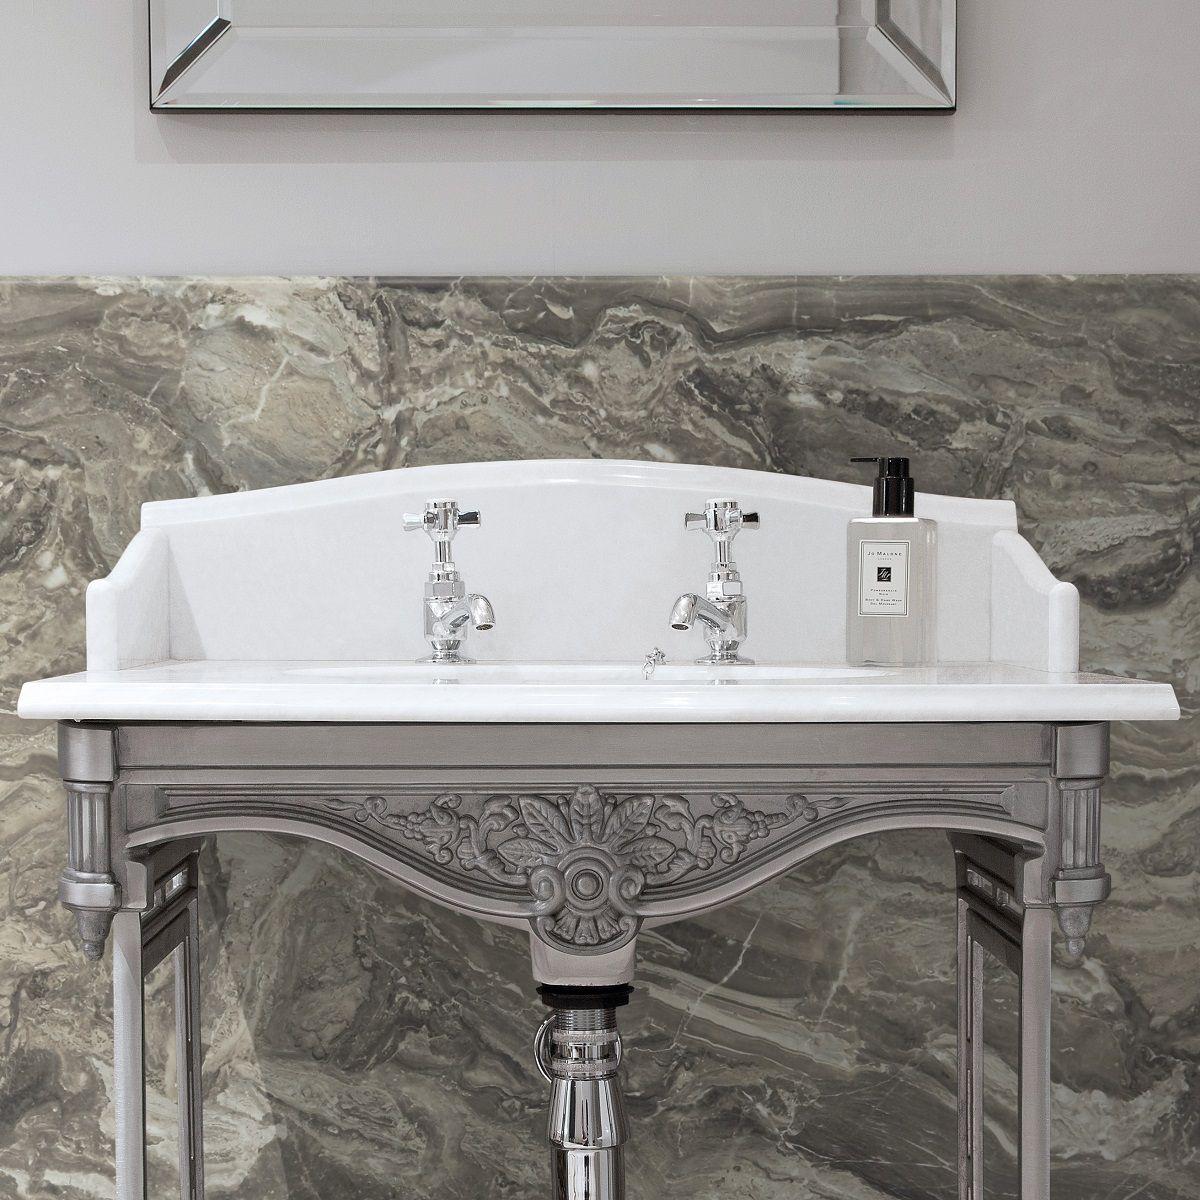 Bushboard Nuance 580mm Feature Panels : UK Bathrooms